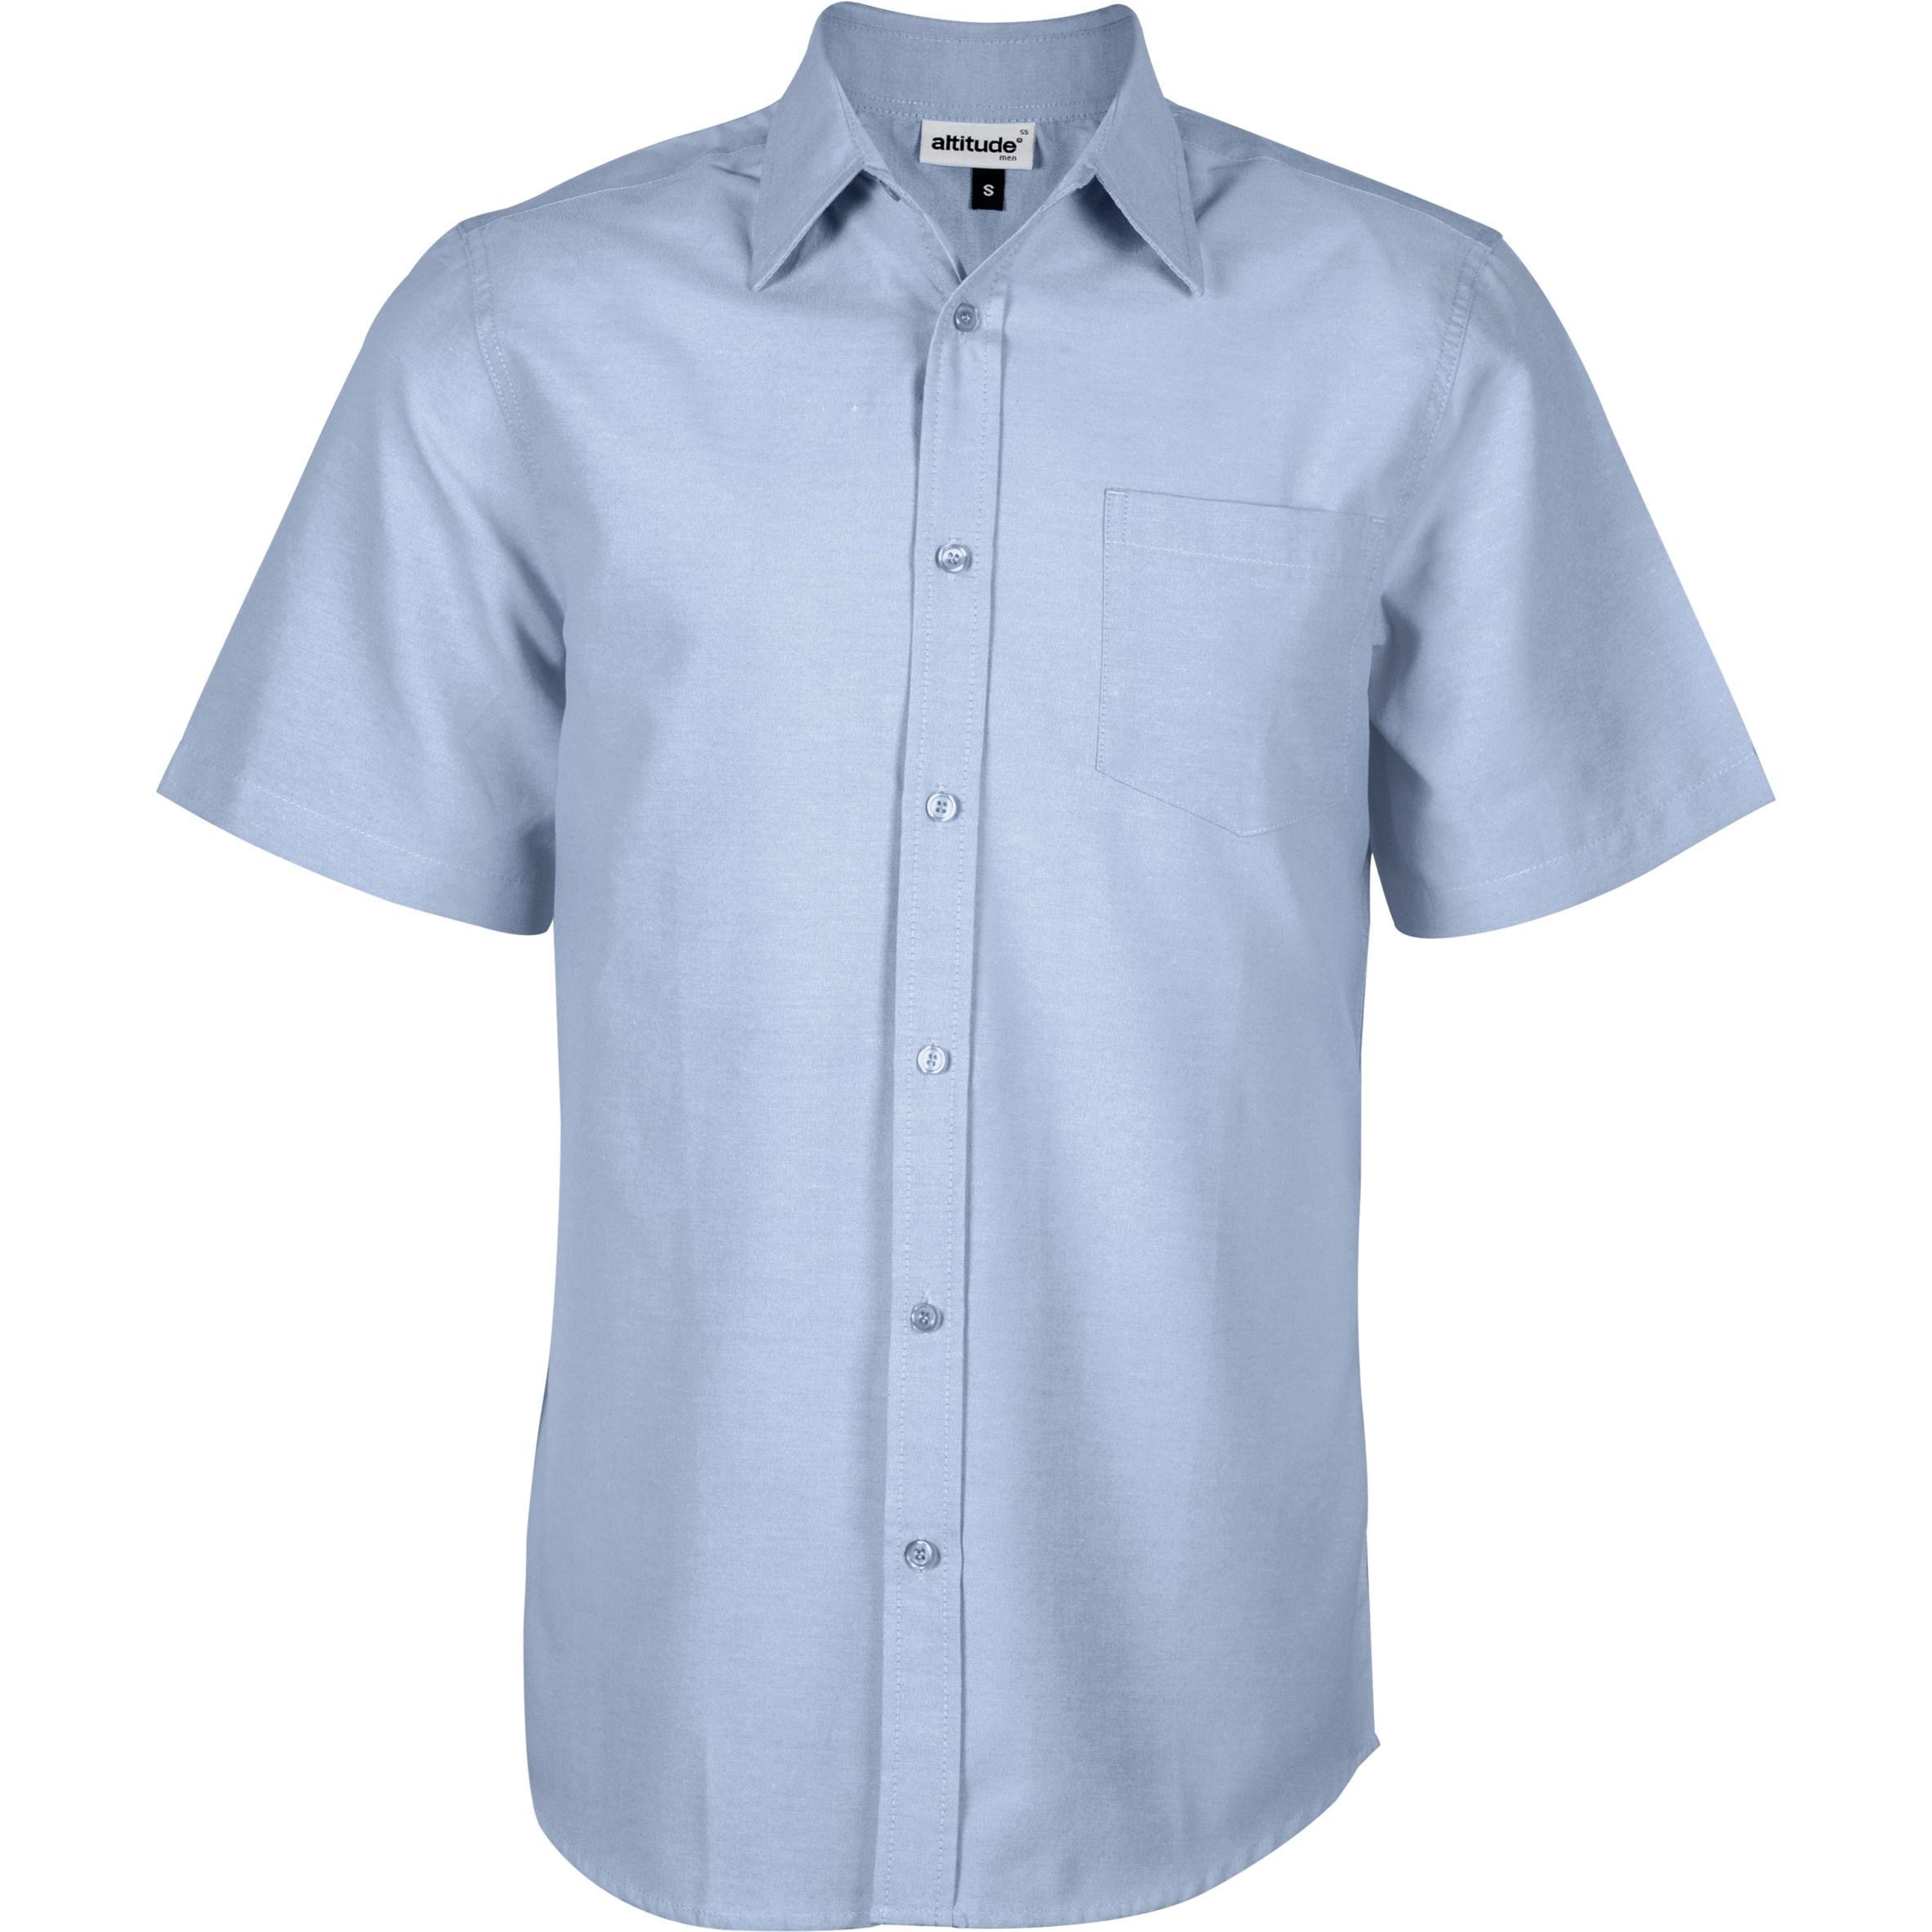 Mens Short Sleeve Oxford Shirt - Light Blue Only